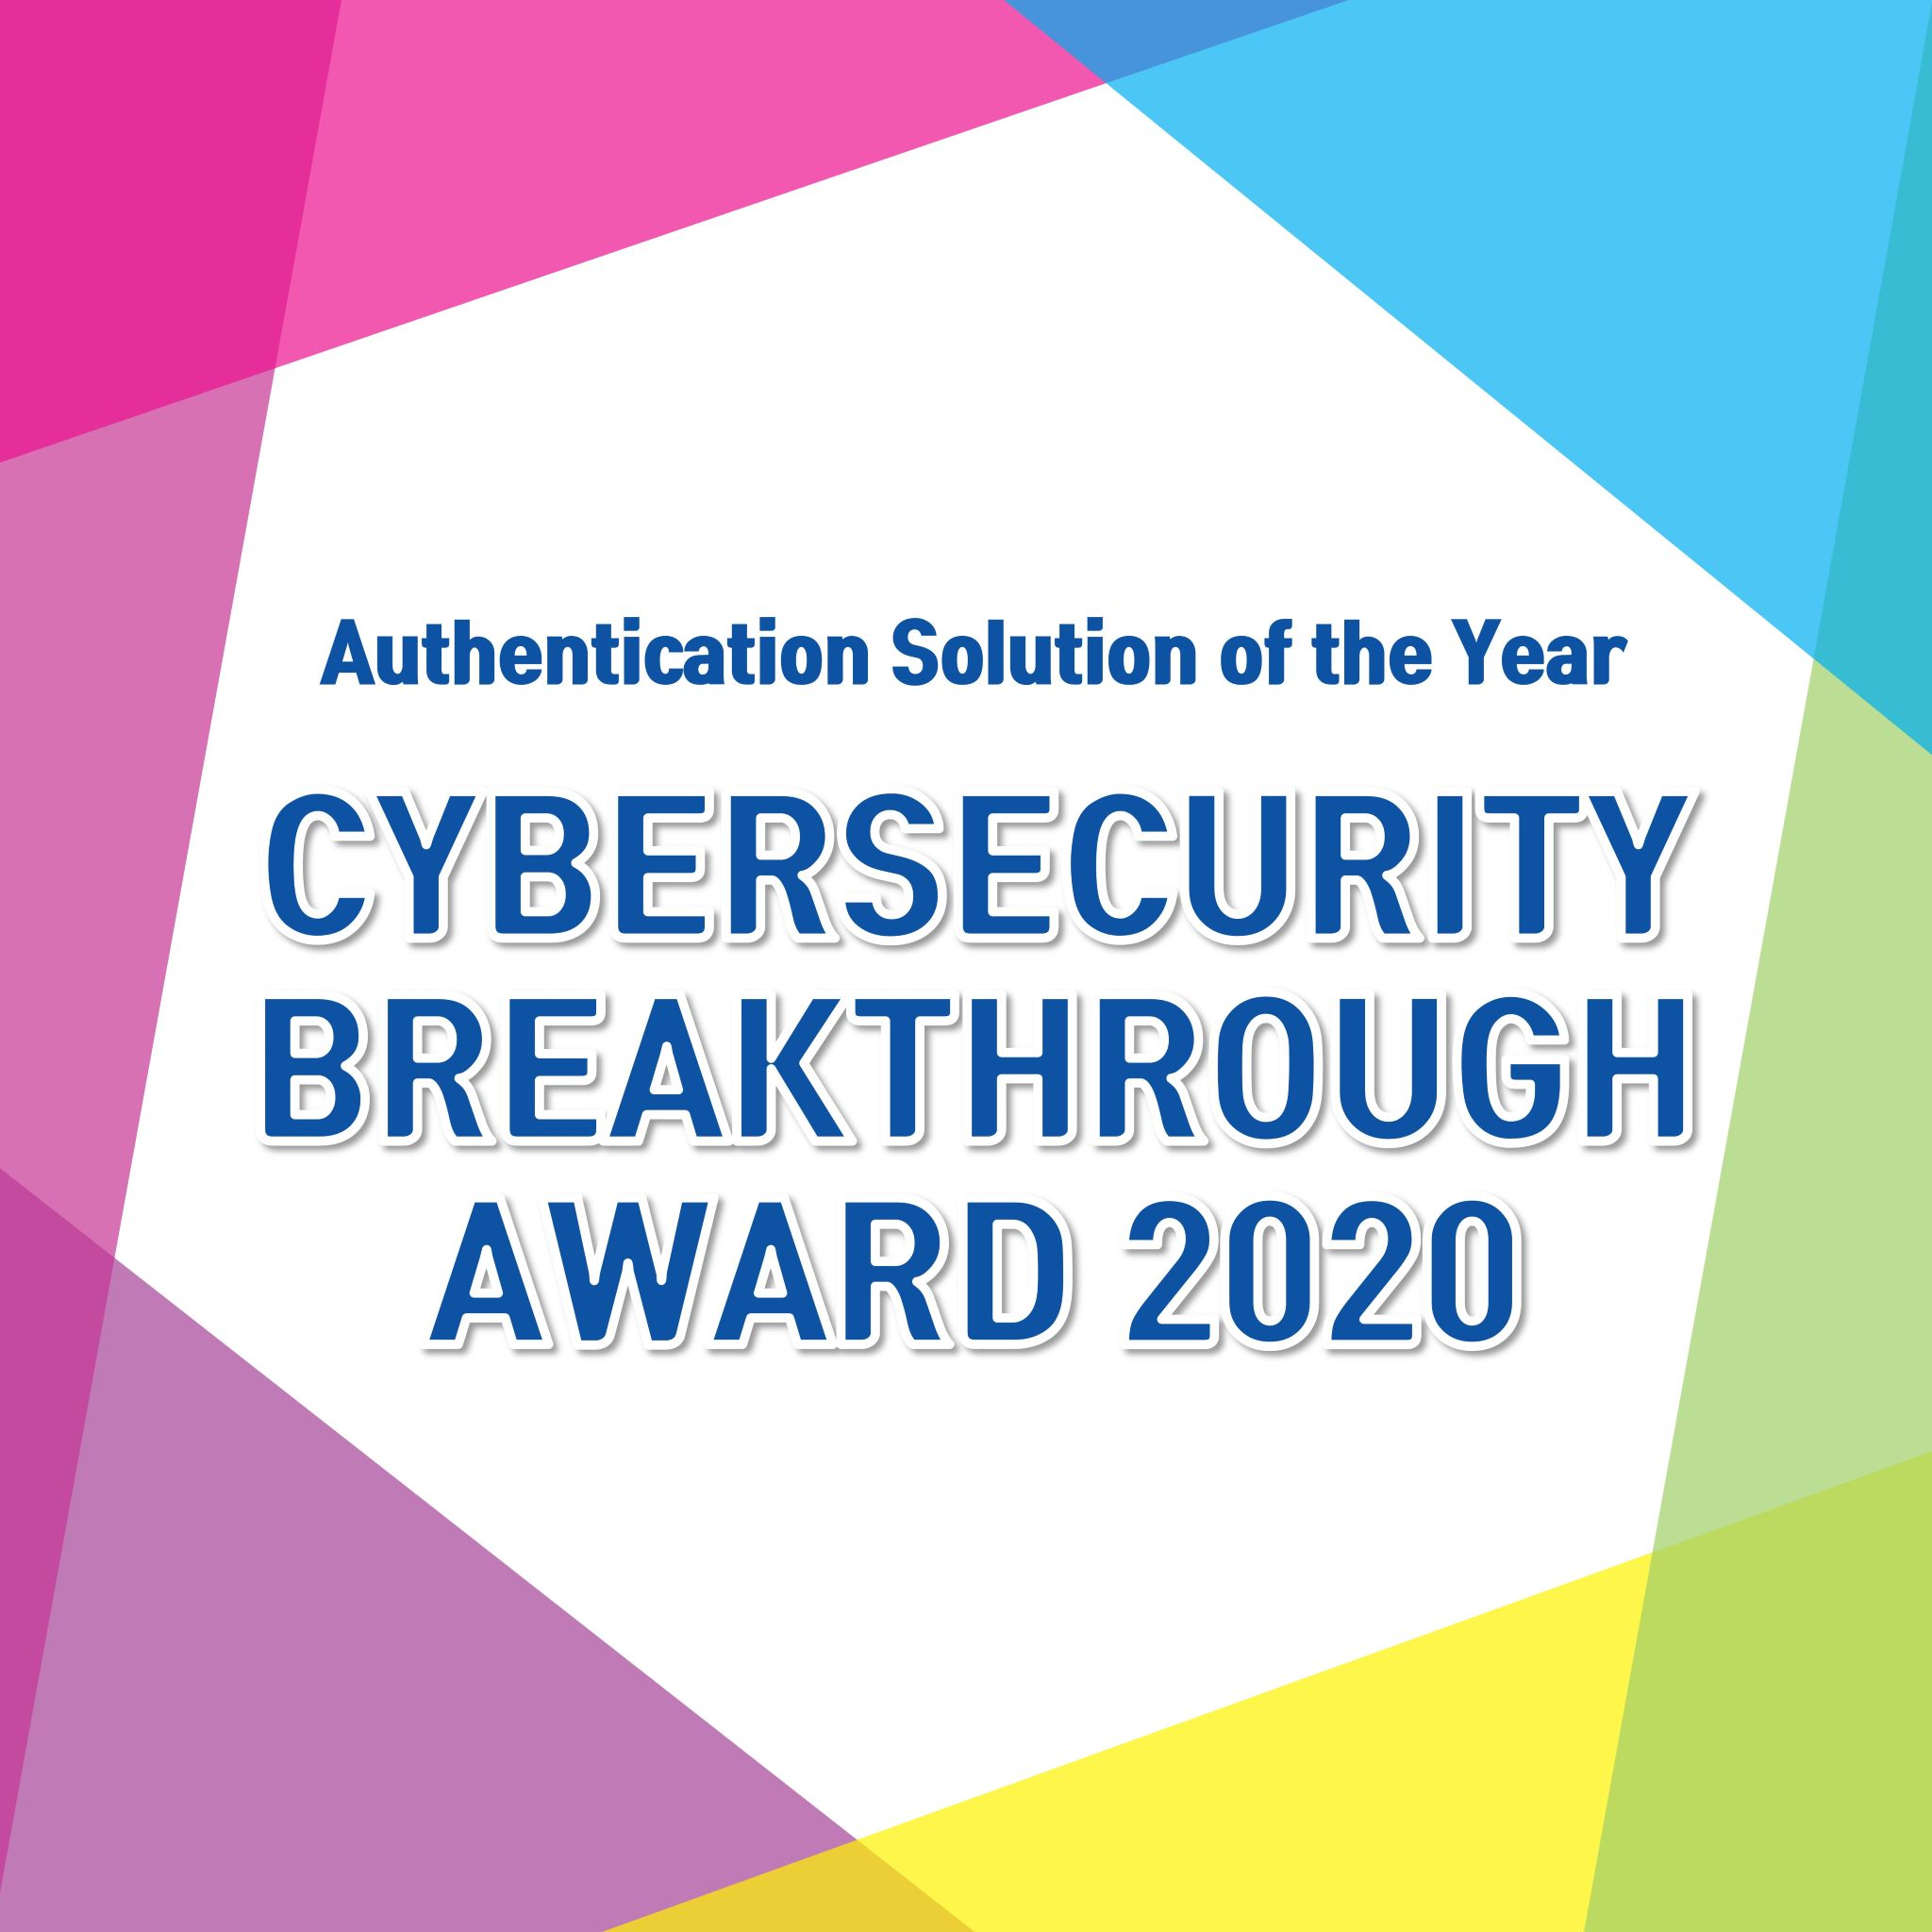 CyberSecurity Breakthrough Award 2020 (1)